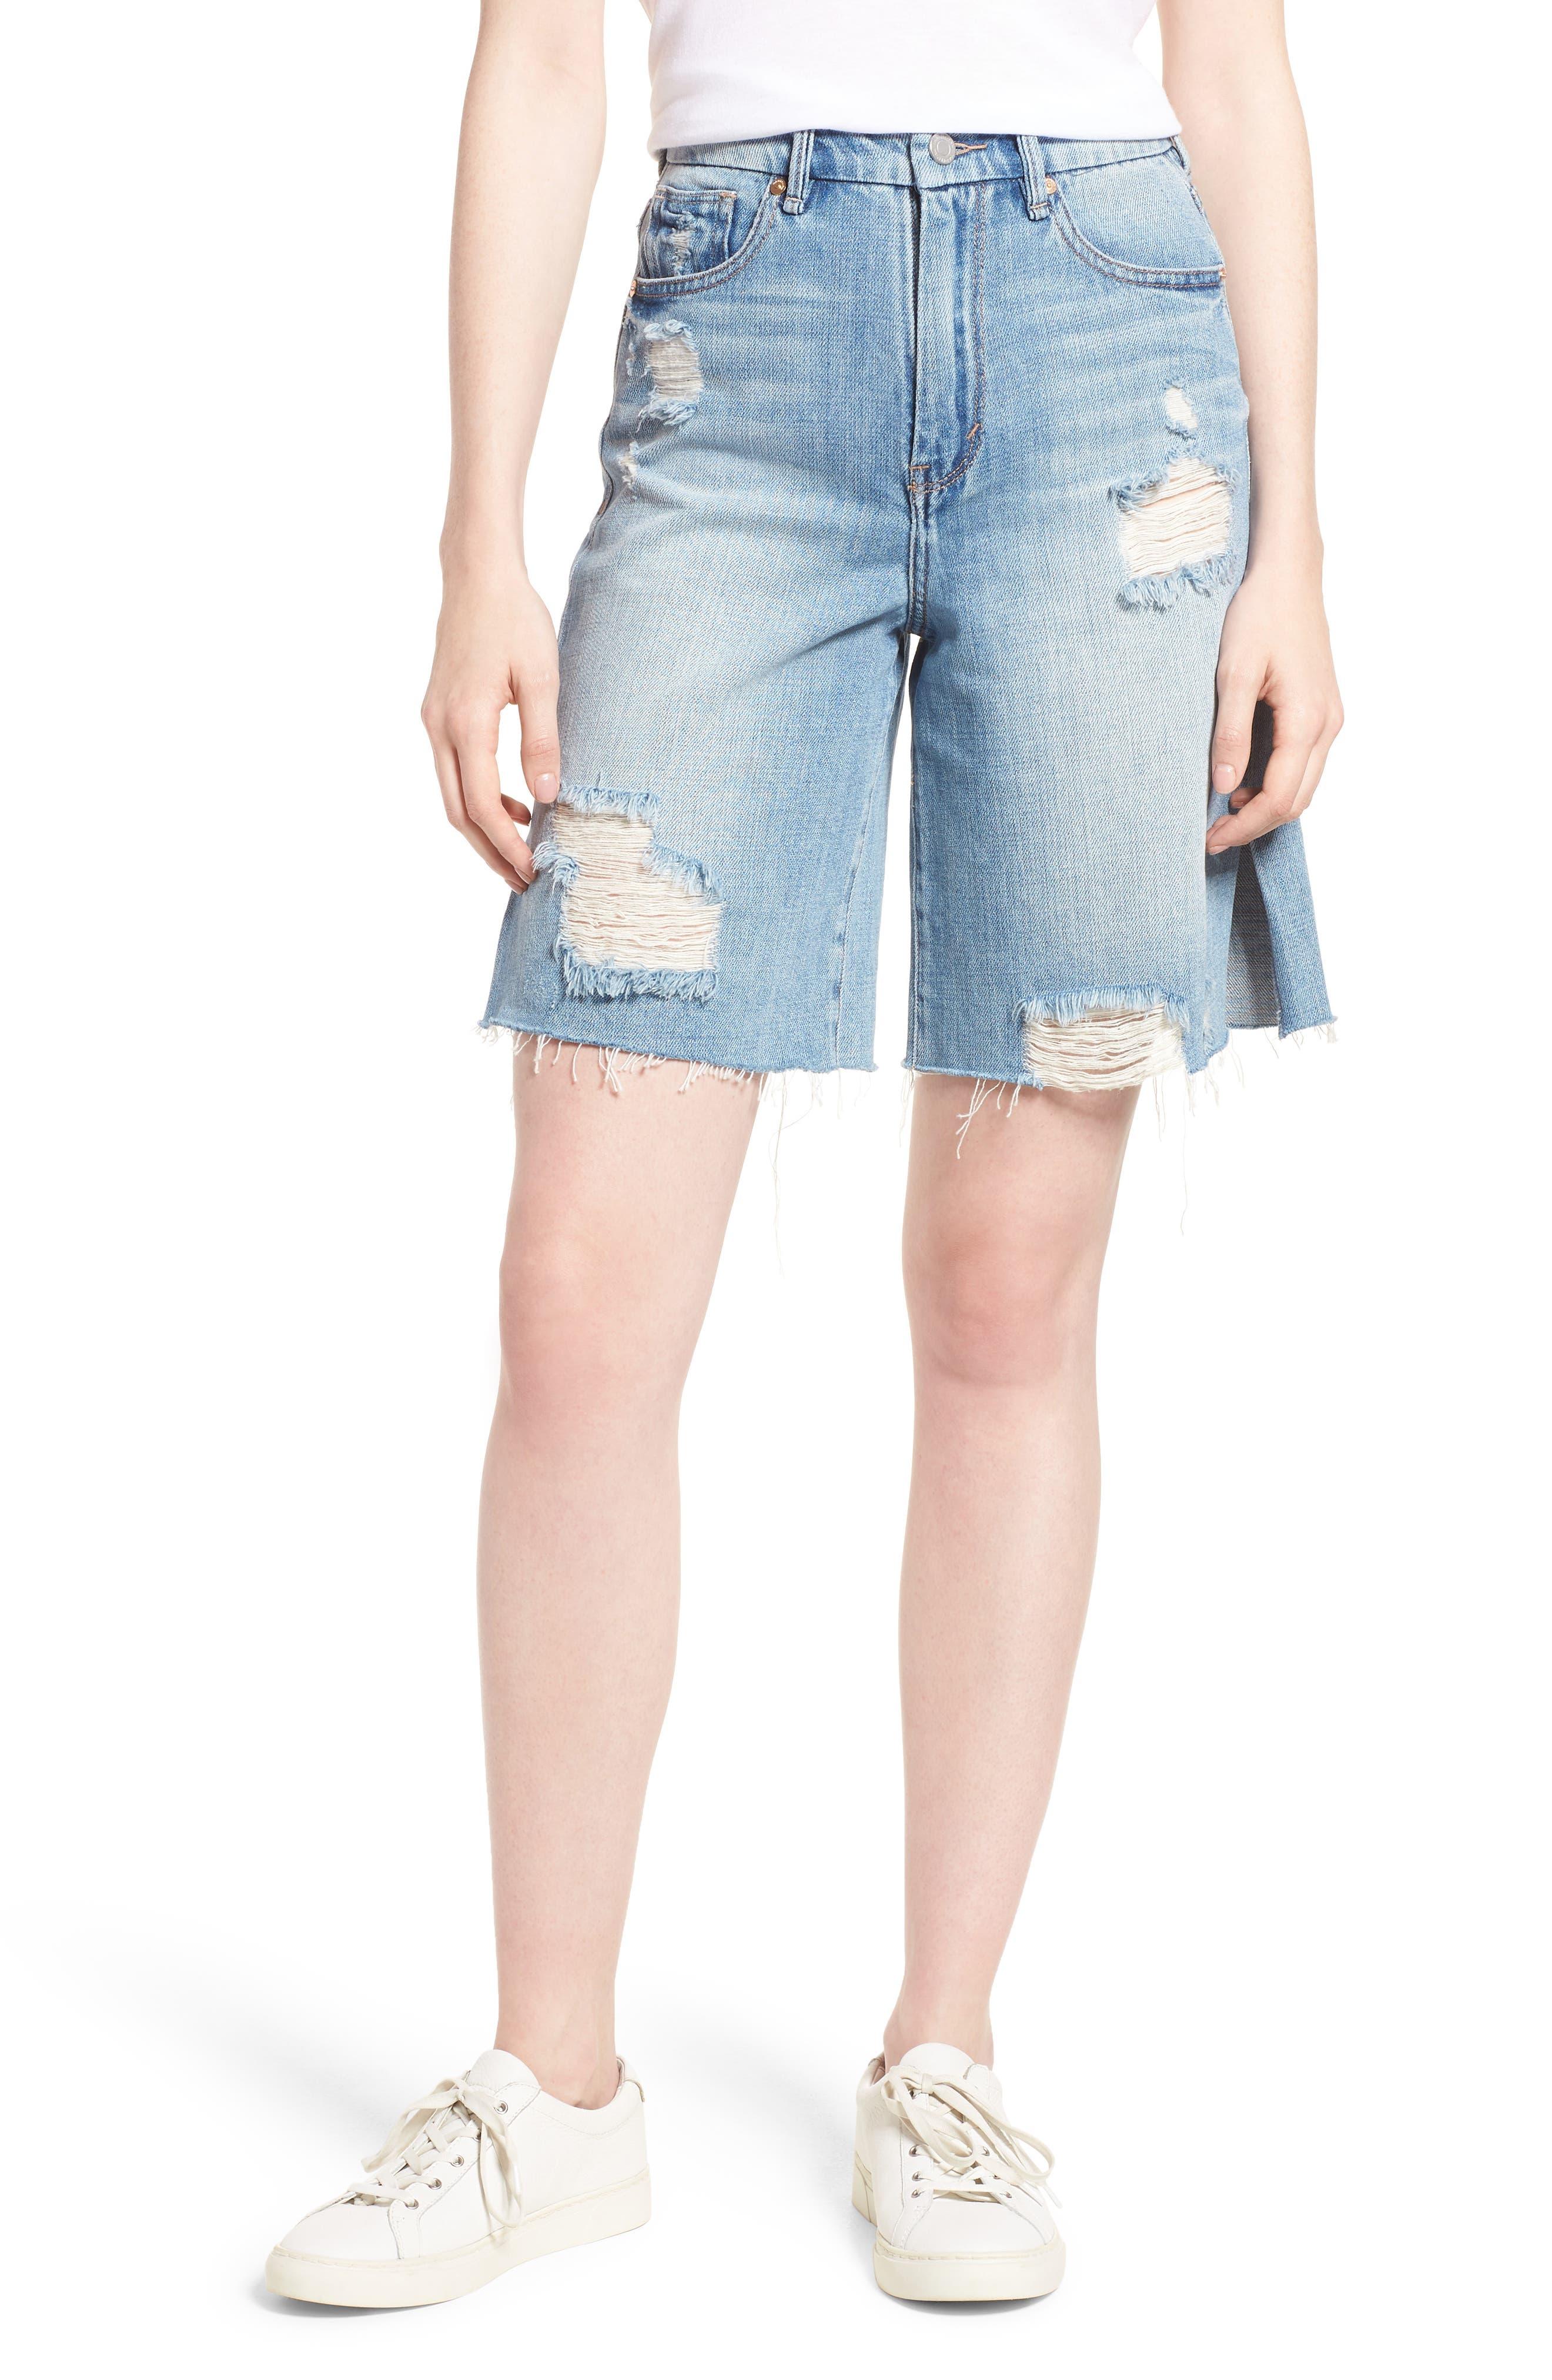 Wylie Hi Rise Distressed Bermuda Denim Shorts,                             Main thumbnail 1, color,                             490